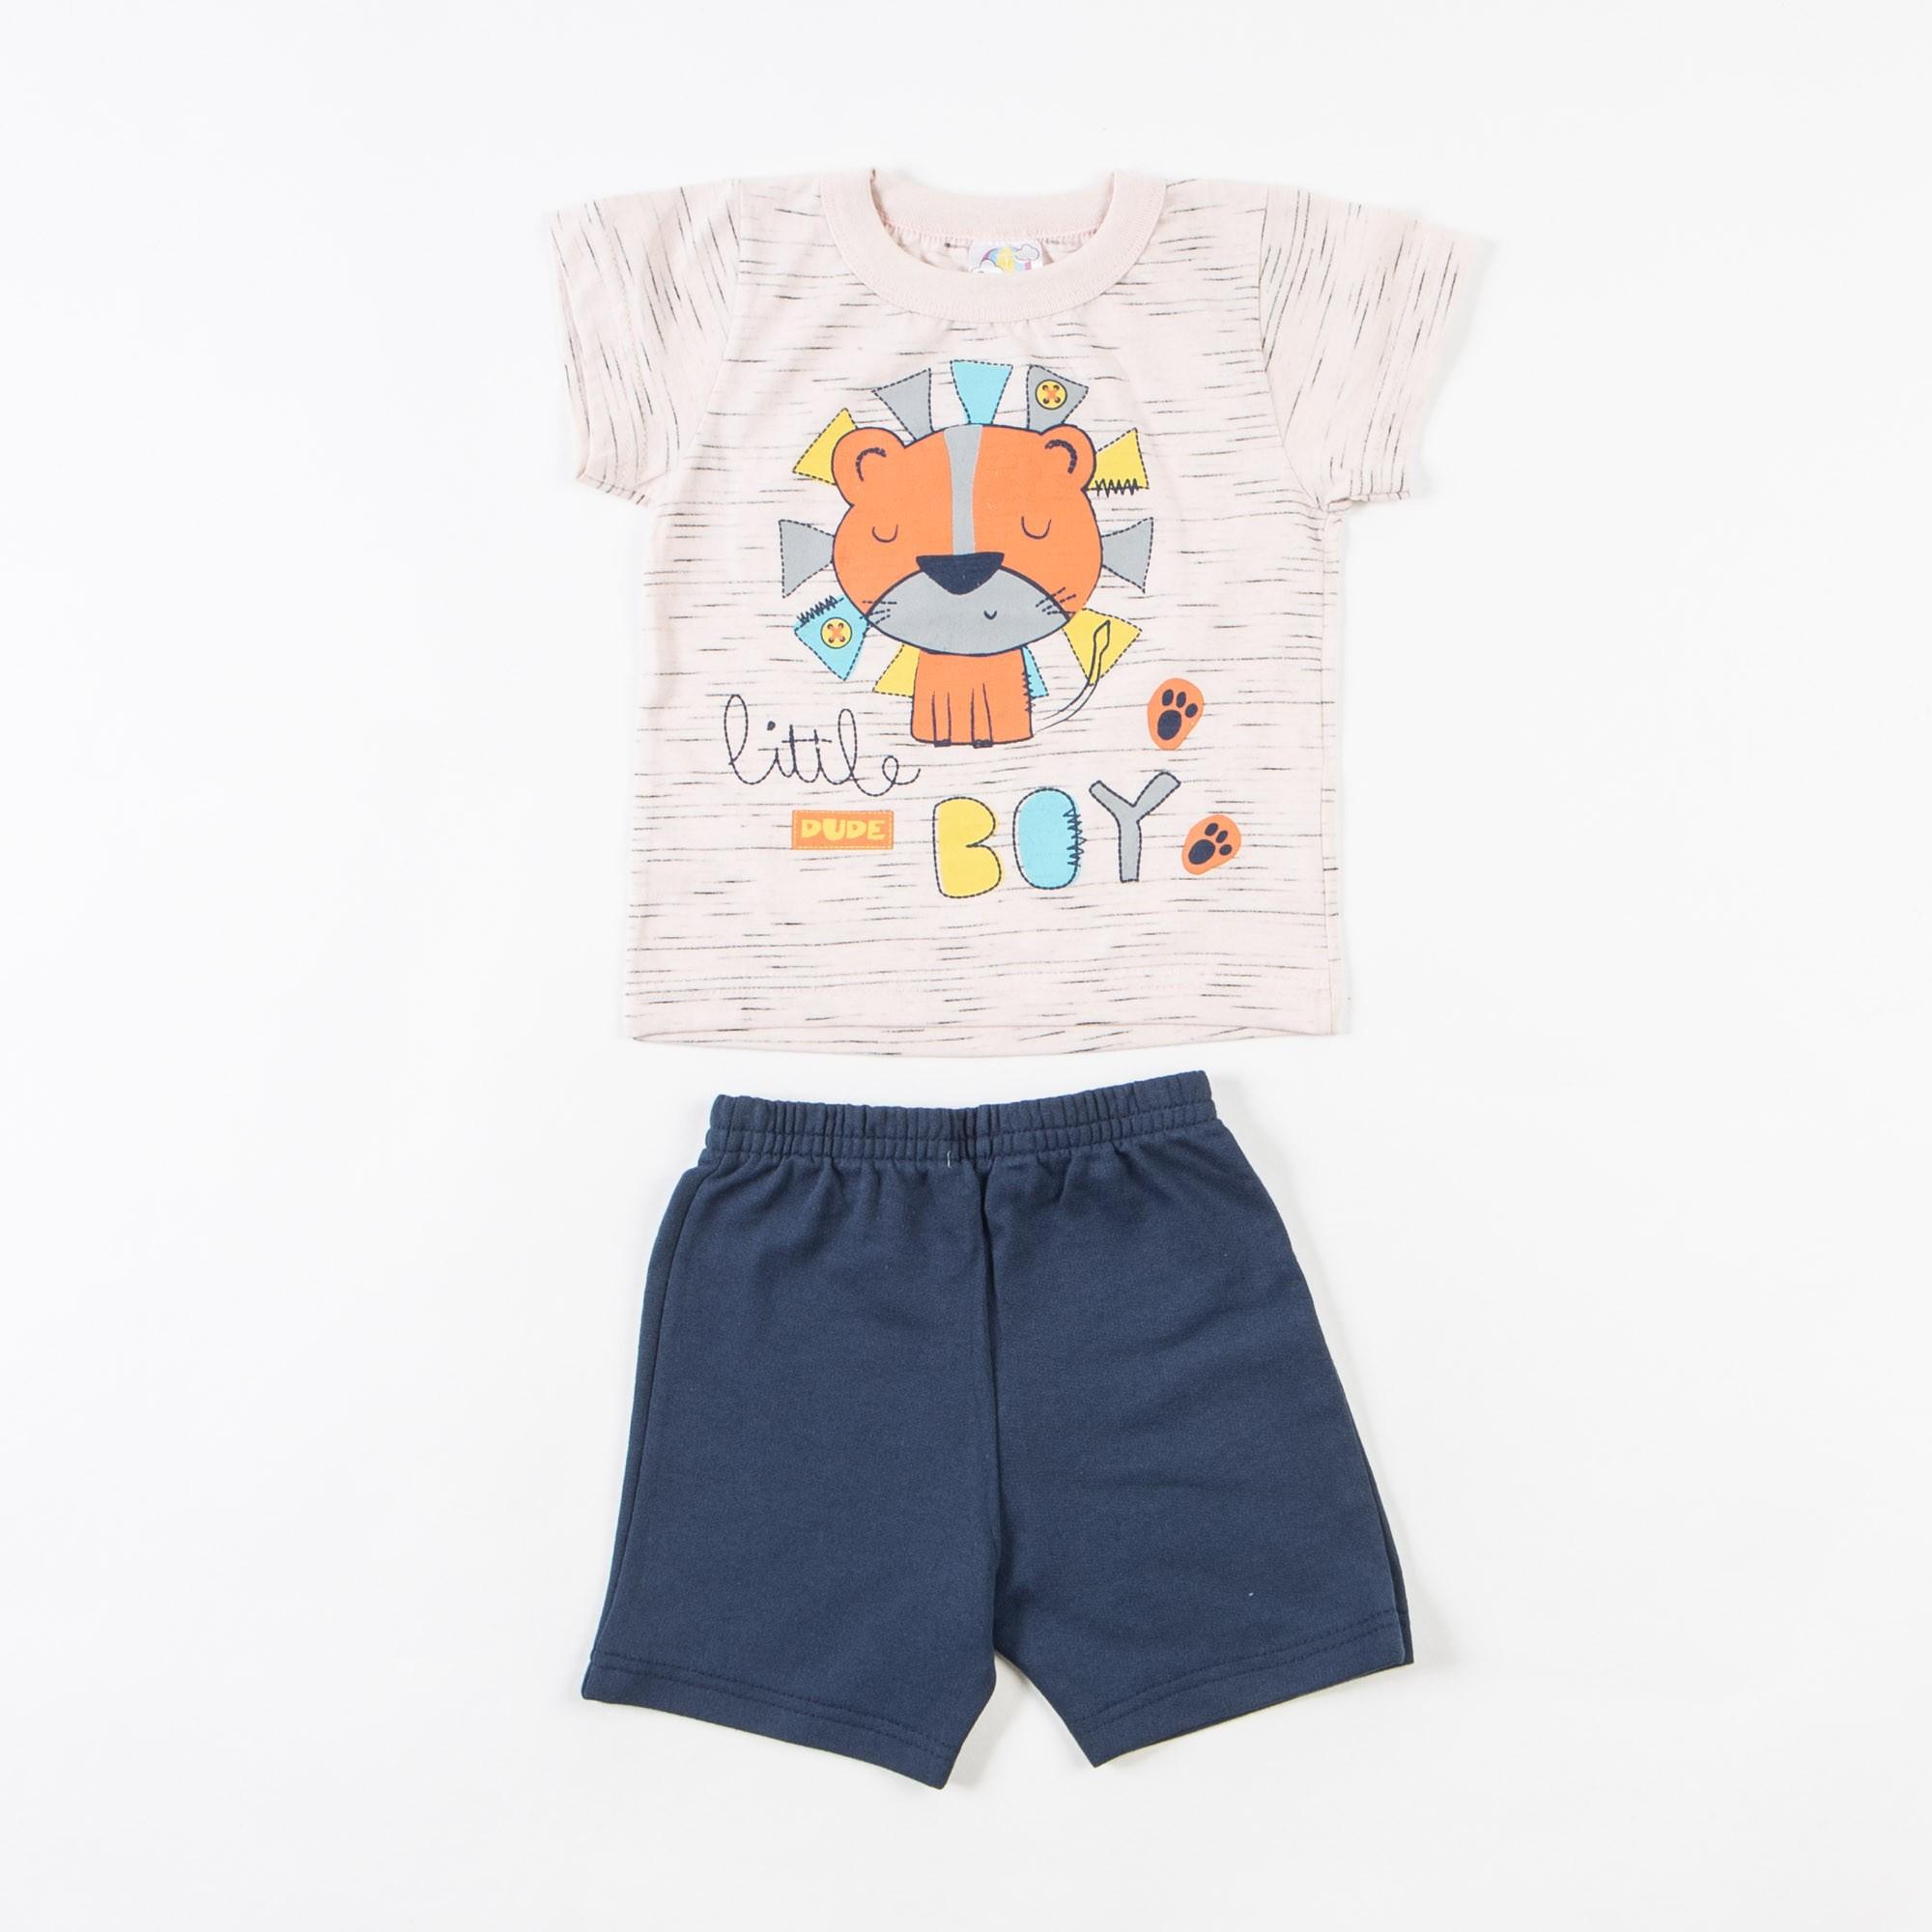 Conjunto Bermuda Moletom  E Camiseta - 1/3